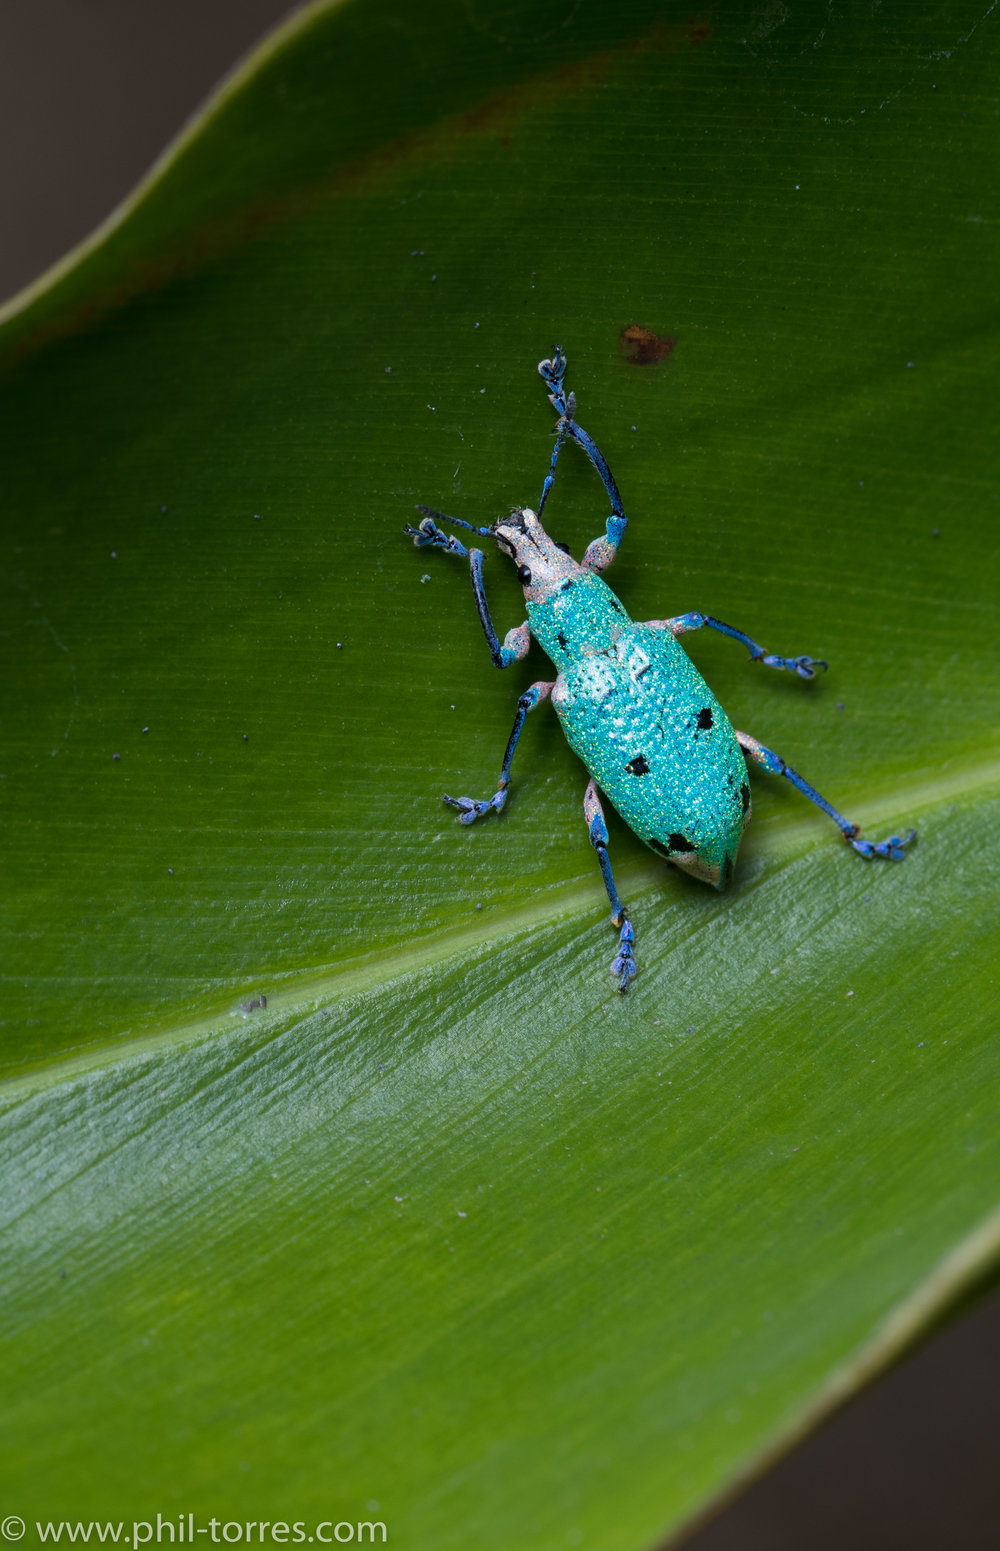 glittery weevil beetle